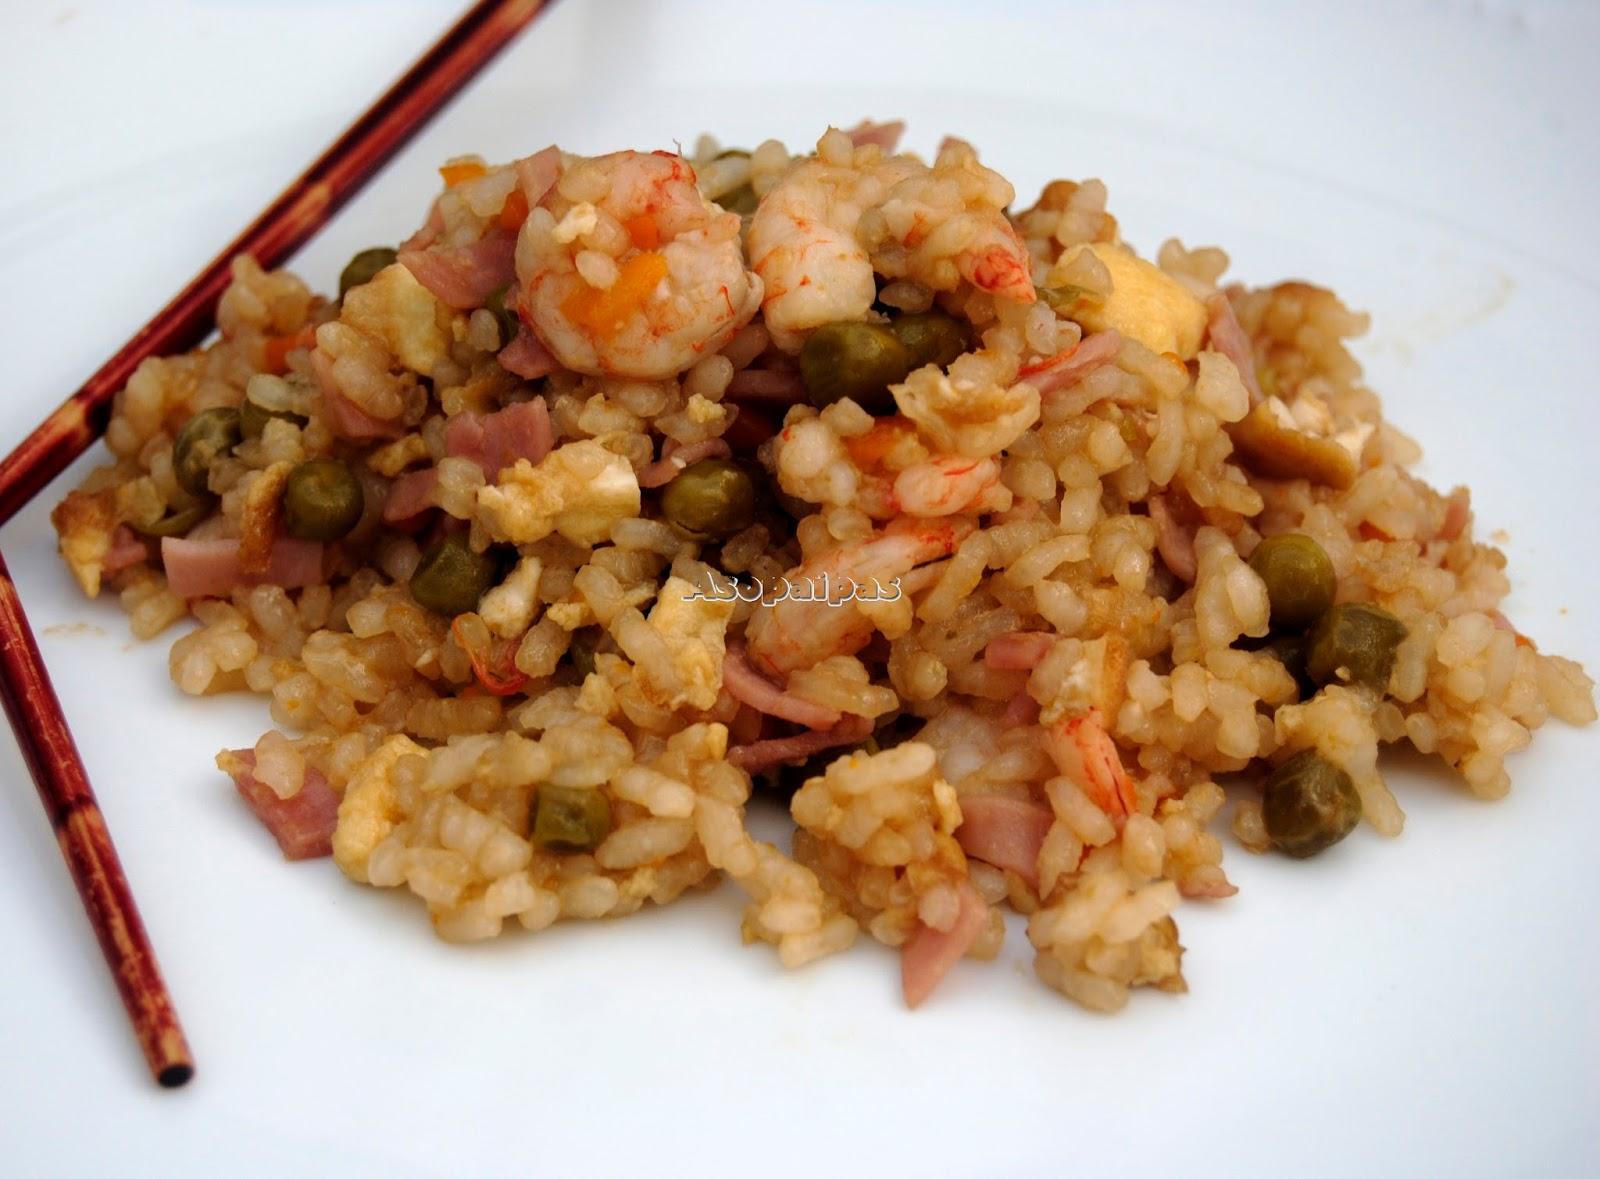 Arroz tres delicias shu d o s n q receta asopaipas for Cocinar arroz 3 delicias